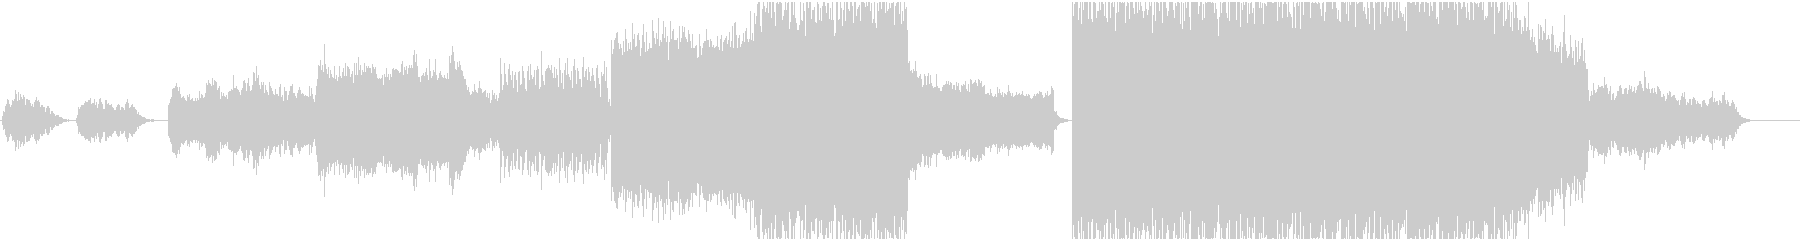 16bit, 48kHz version's unreproduced waveform